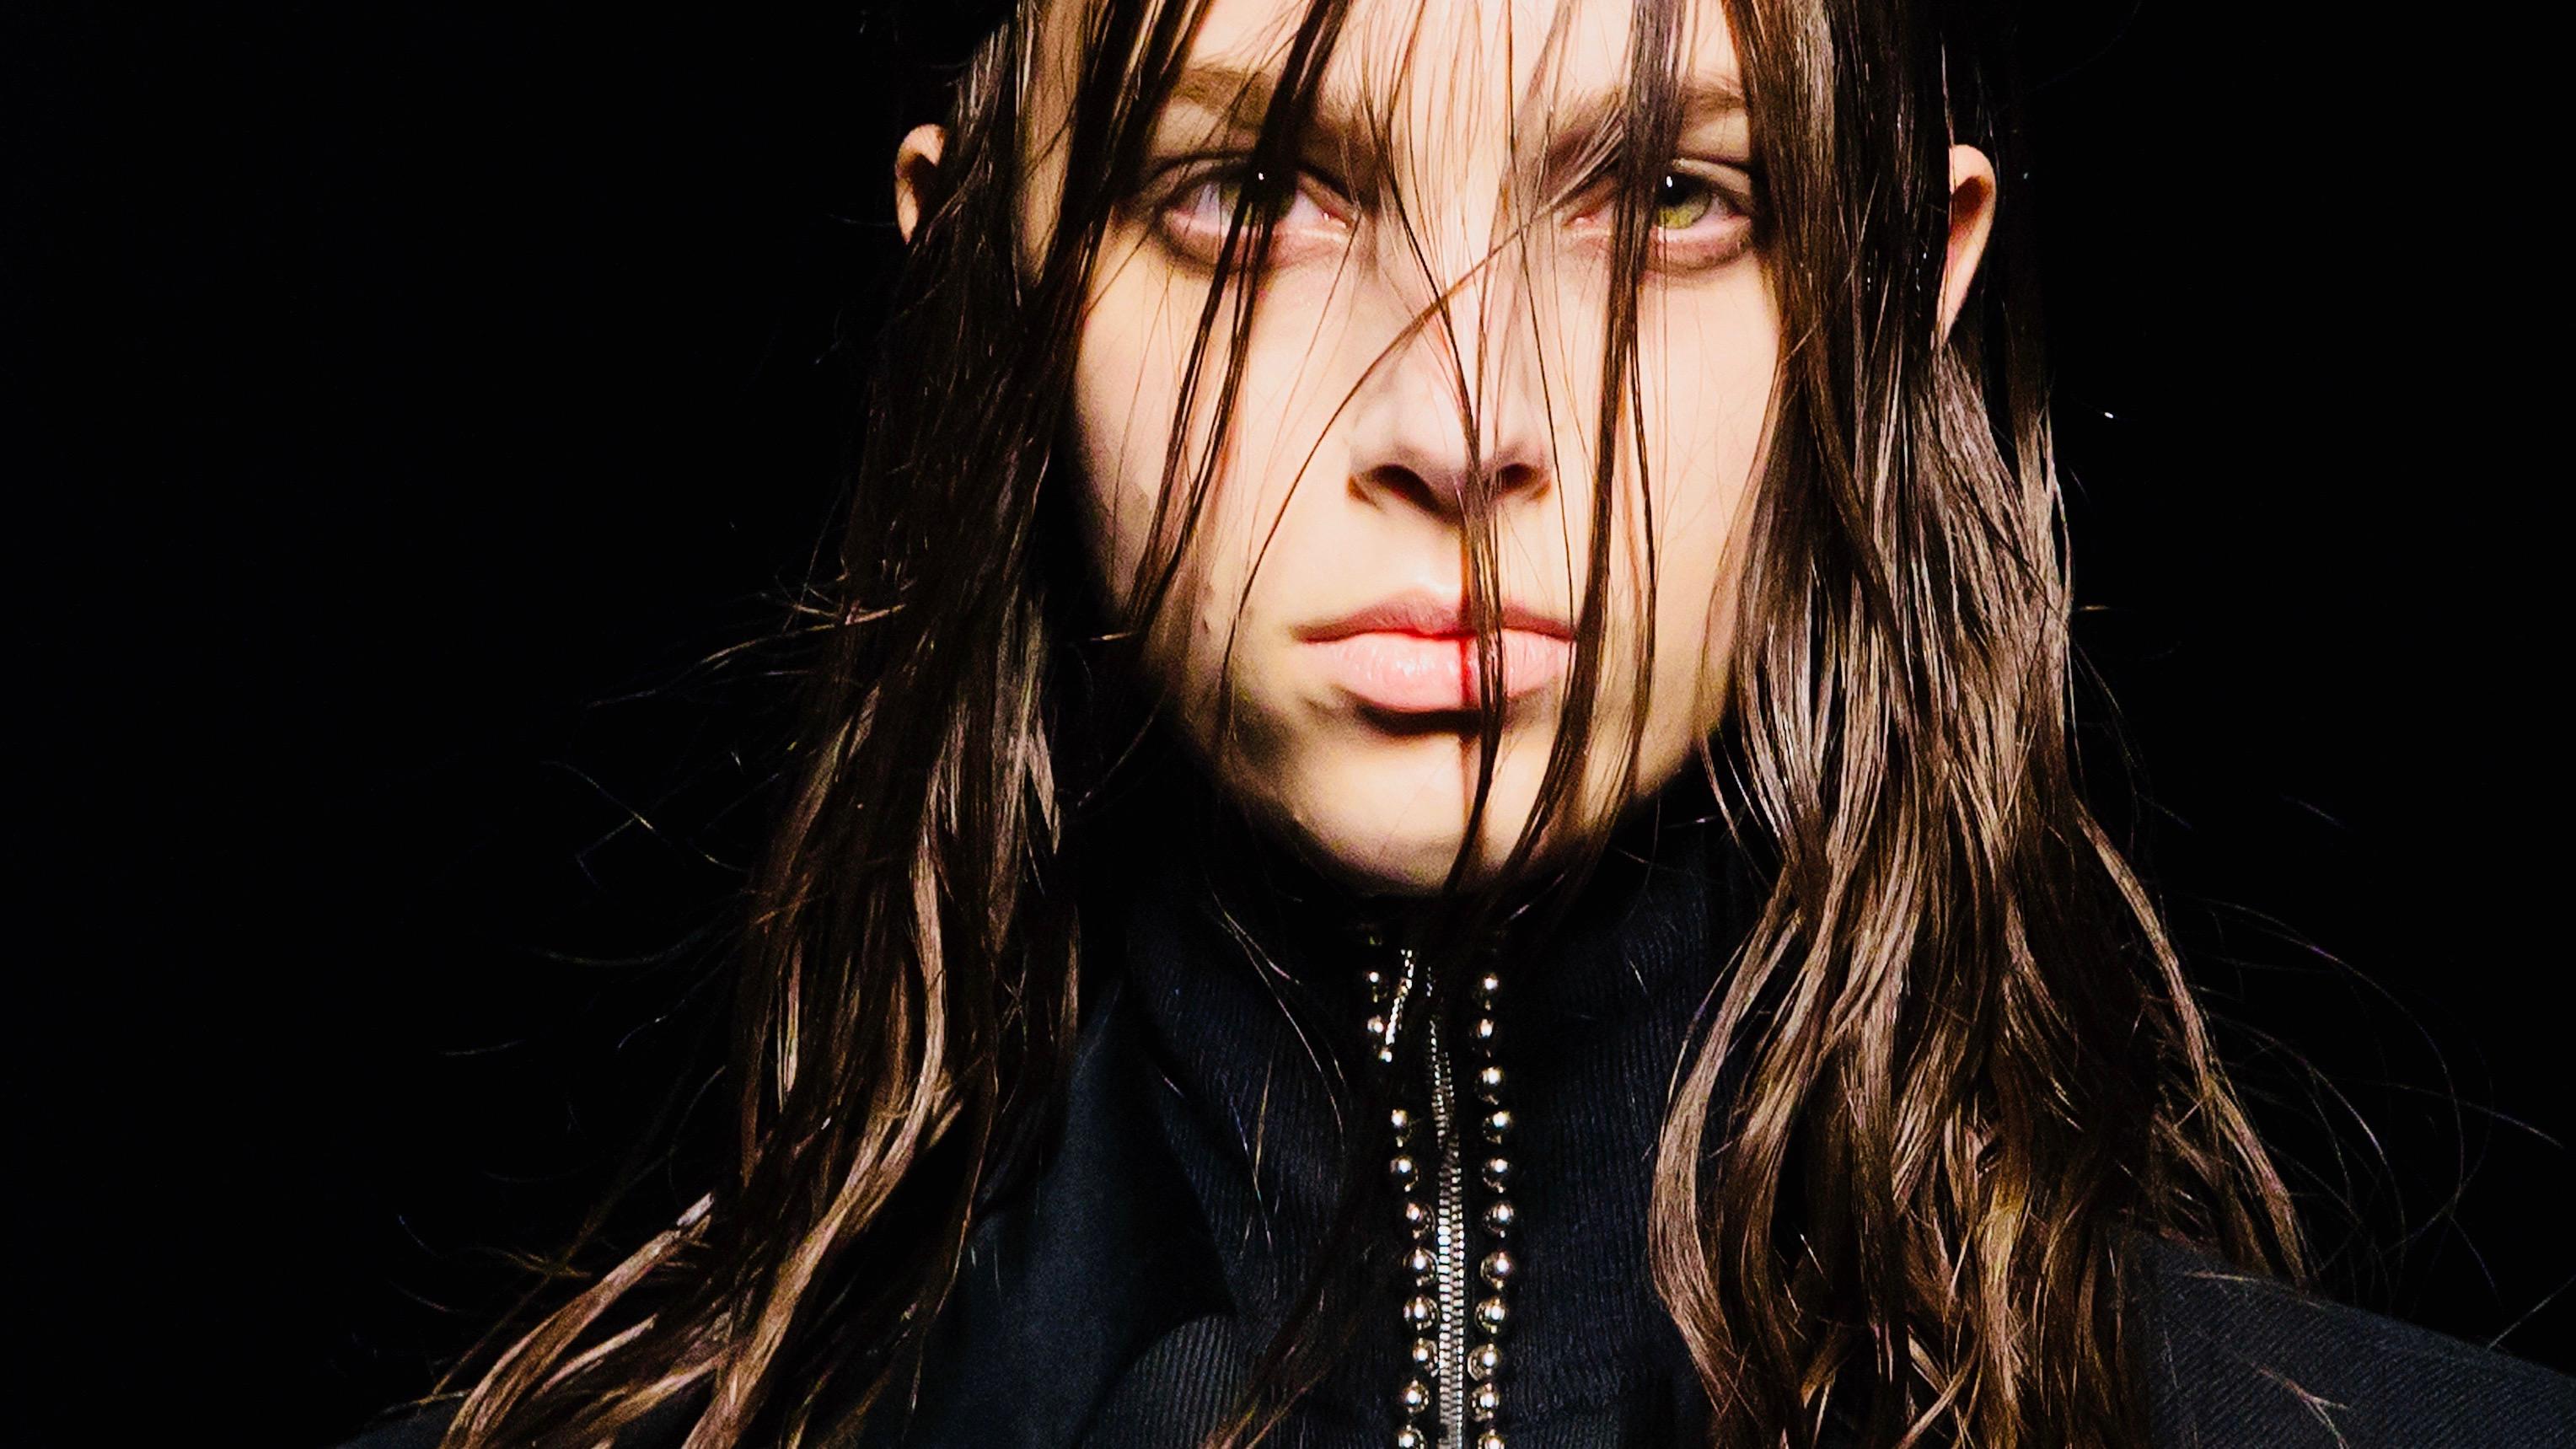 Alexander Wang model with disheveled hair.